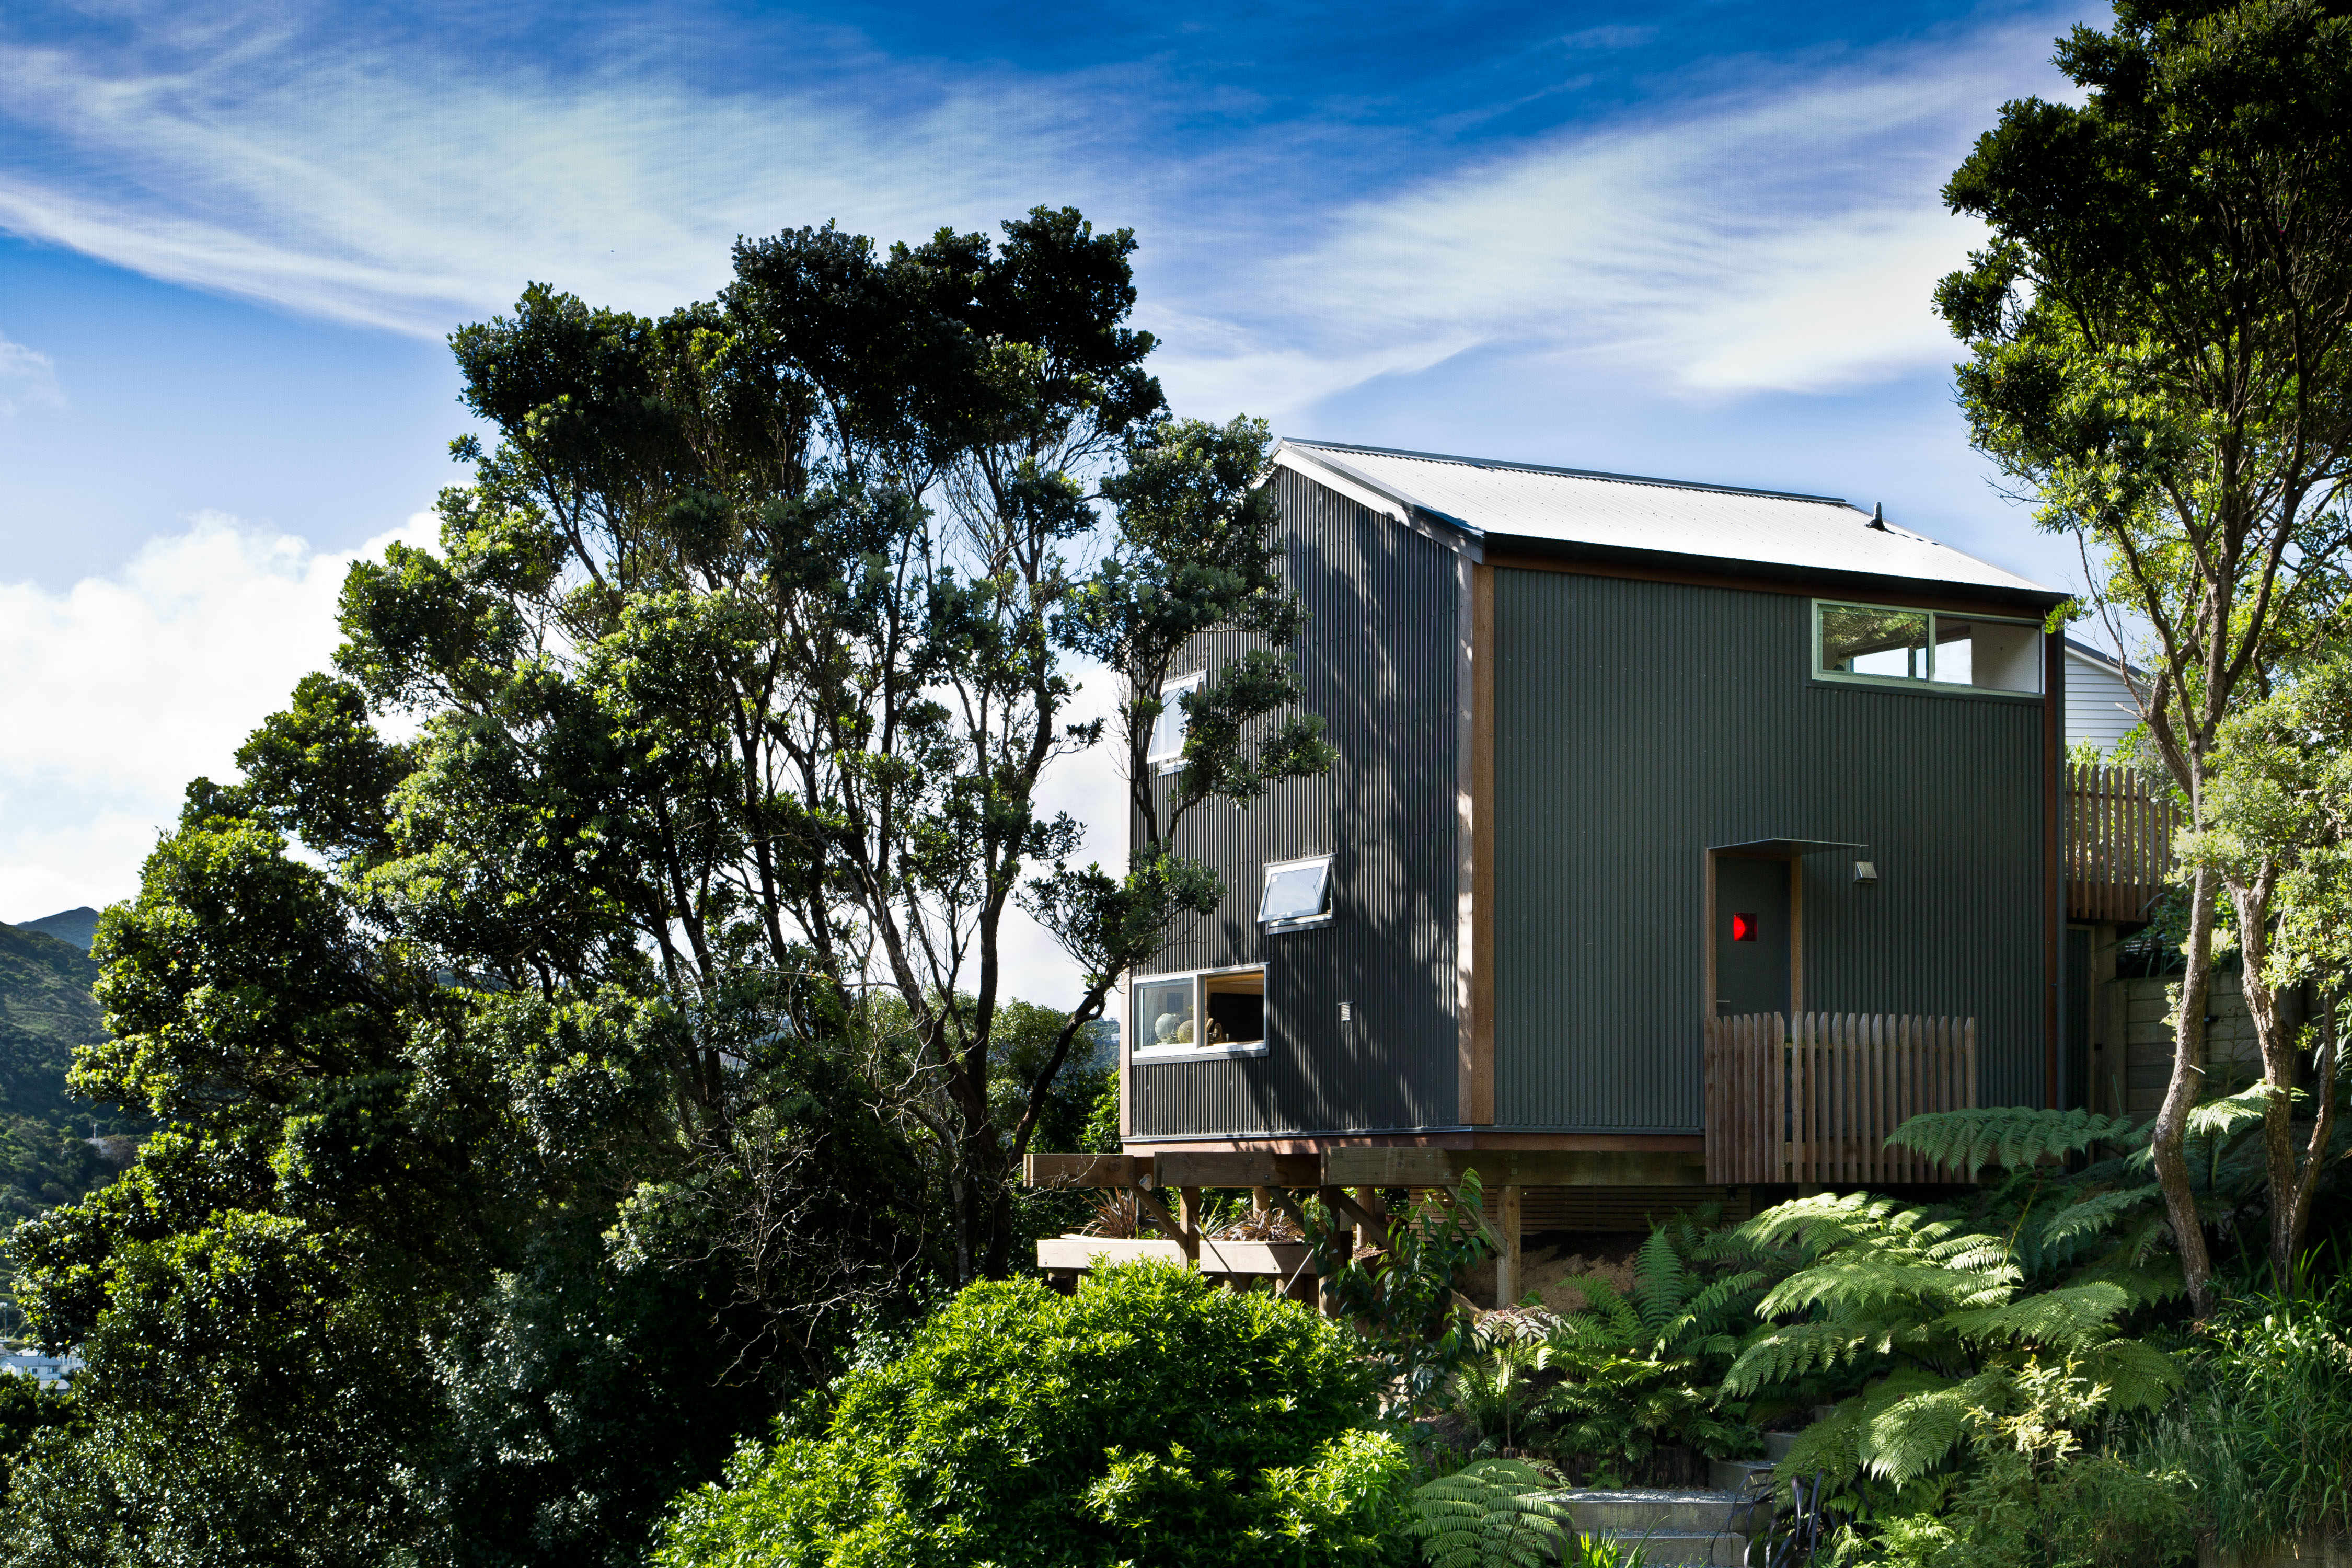 Island Bay House